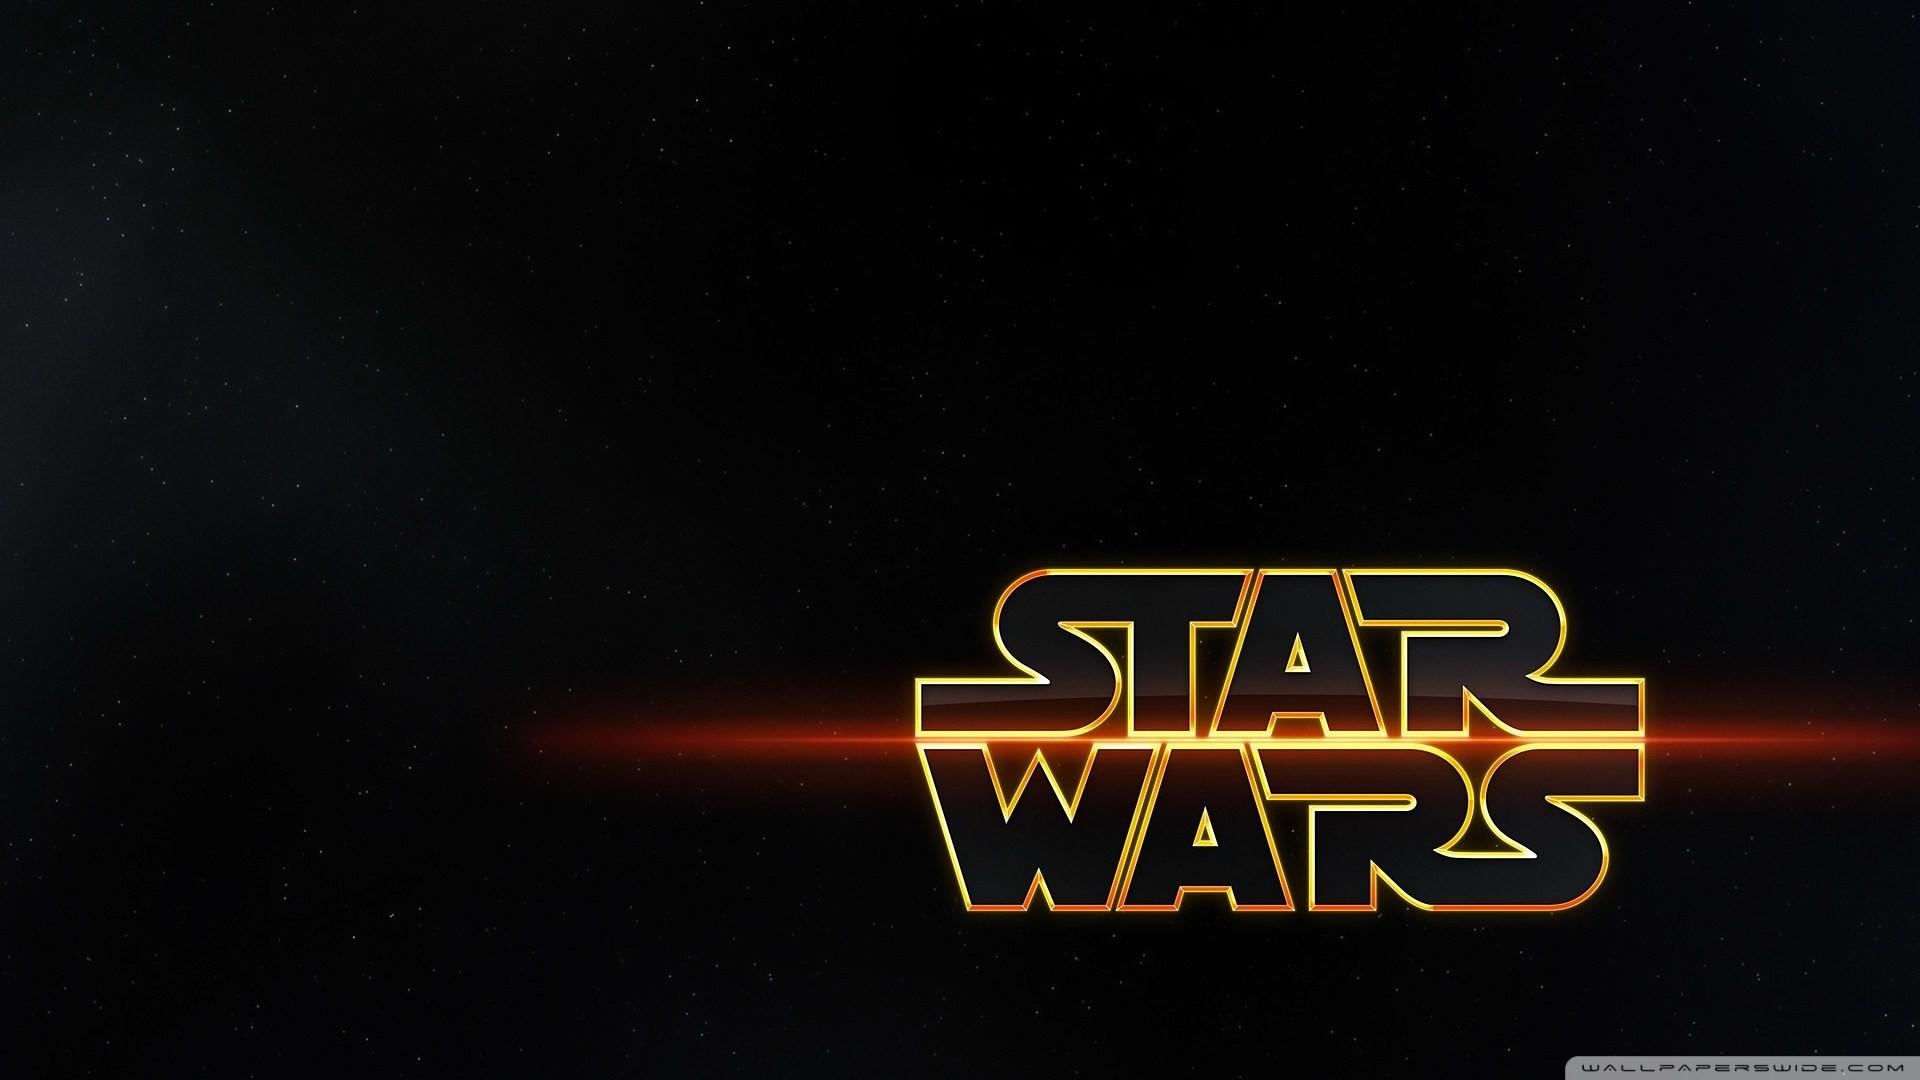 Star Wars Movie Logo HD Wallpaper Movies